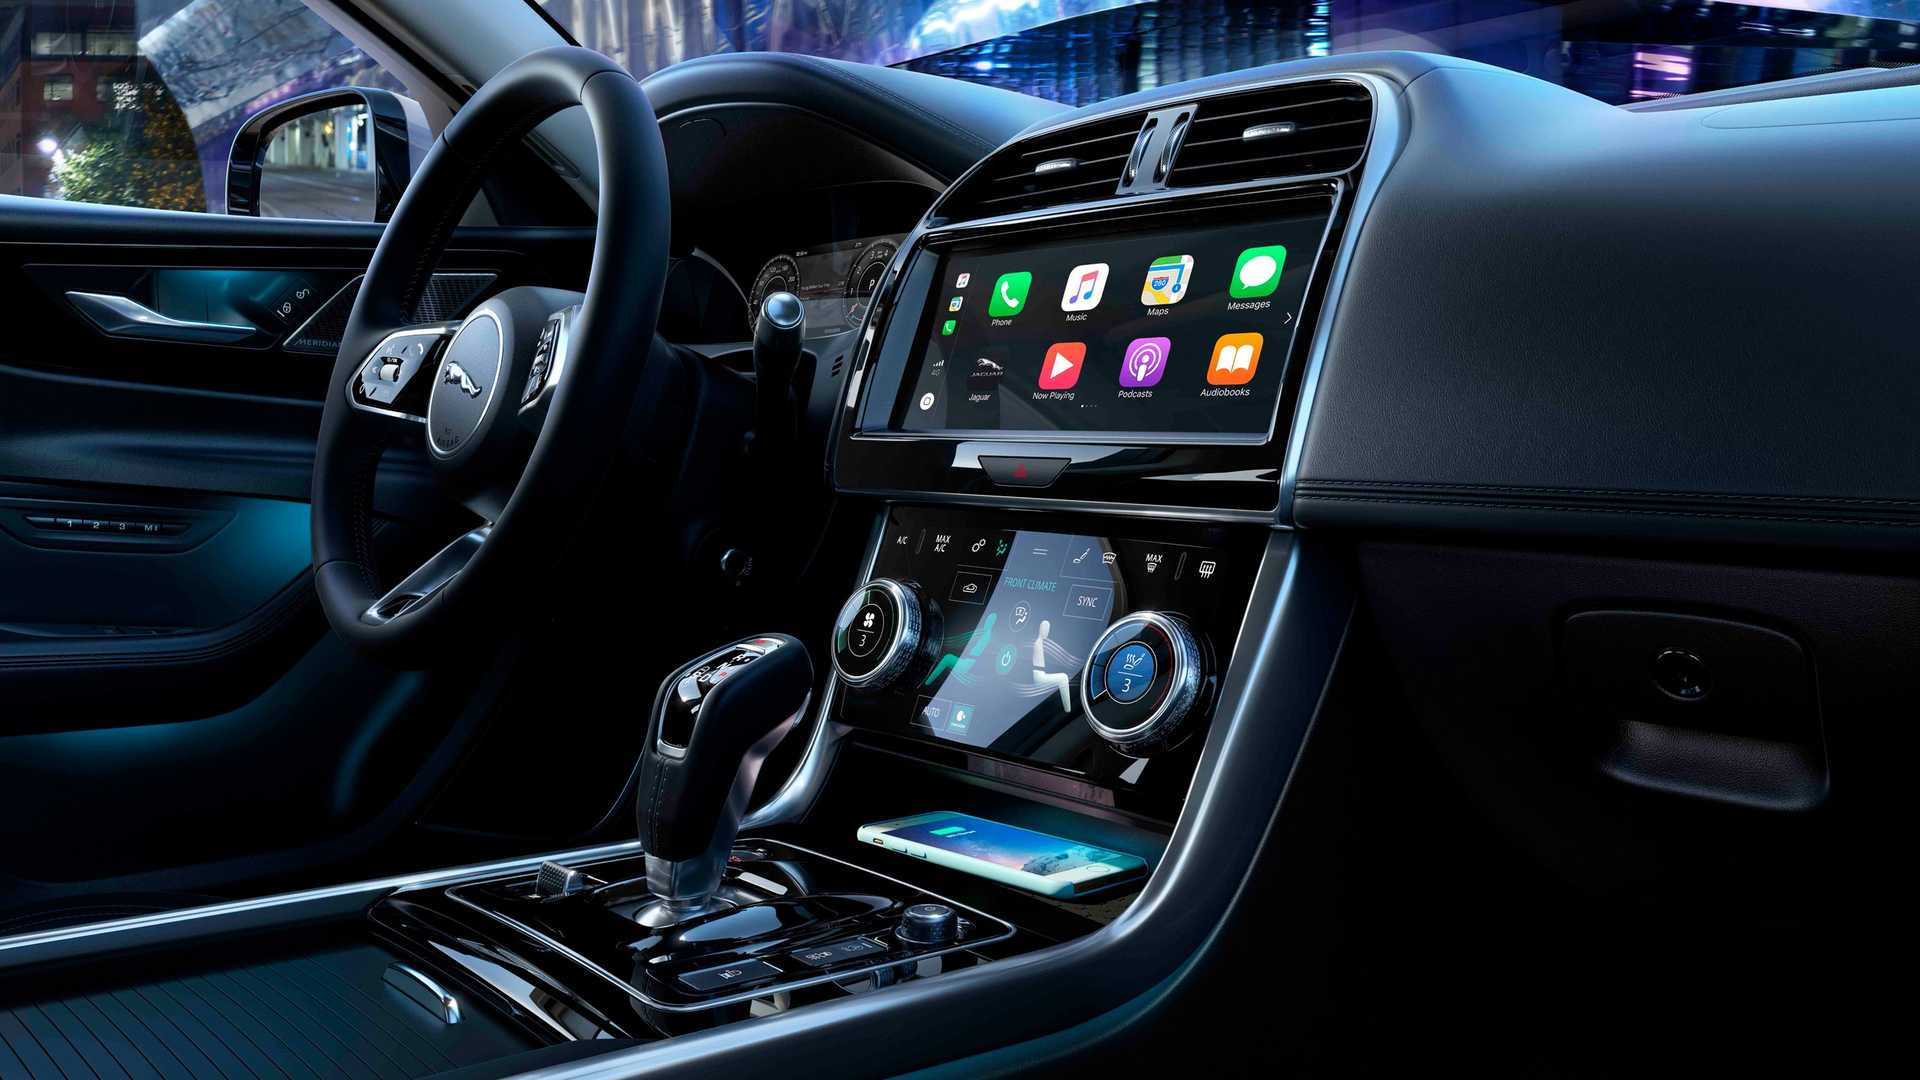 2020 Jaguar Xe Central Console Wallpaper 120 Hd Wallpapers